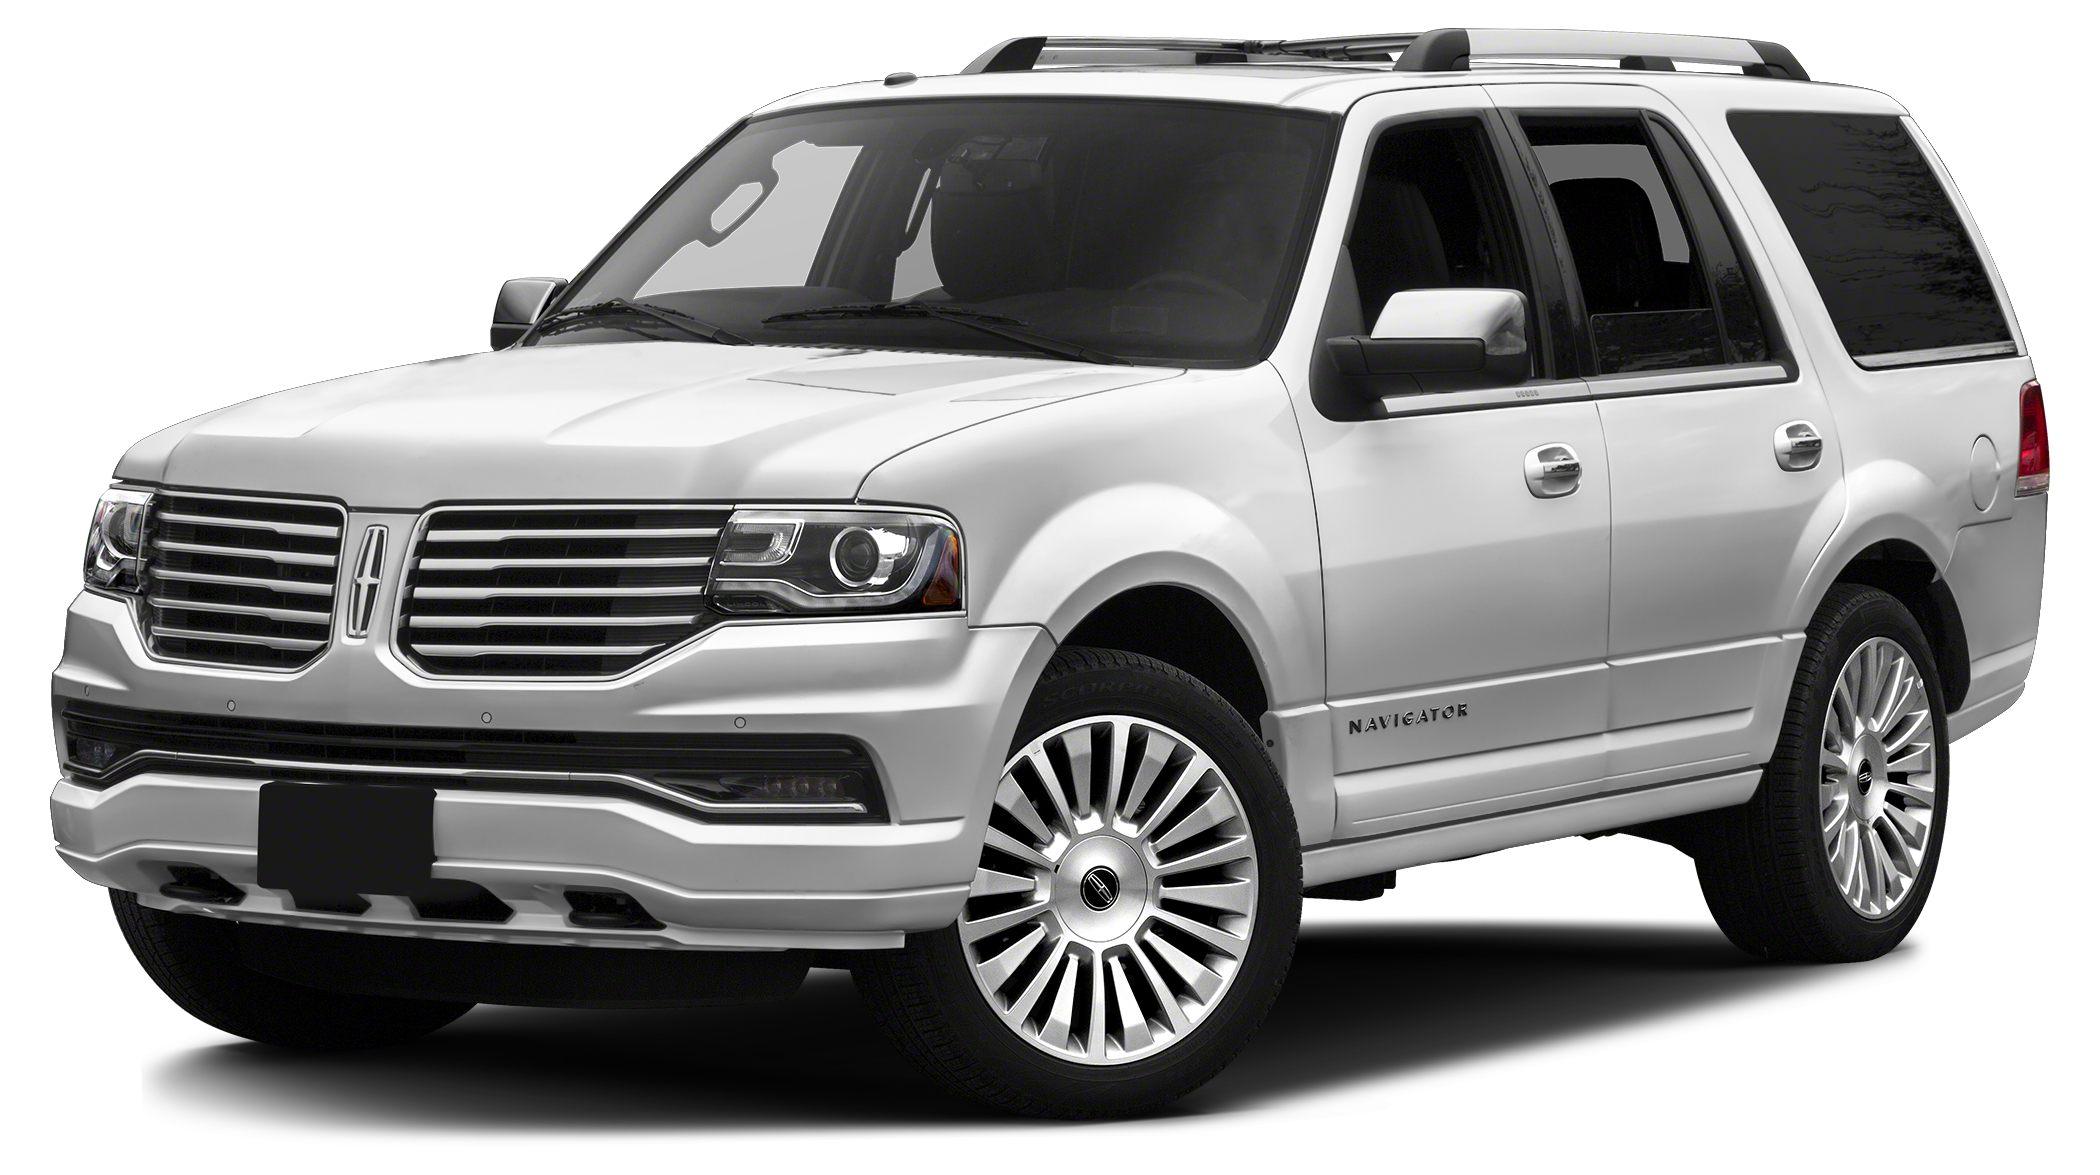 2016 Lincoln Navigator Select Miles 131Color Silver Stock 16N16 VIN 5LMJJ2HT7GEL09692